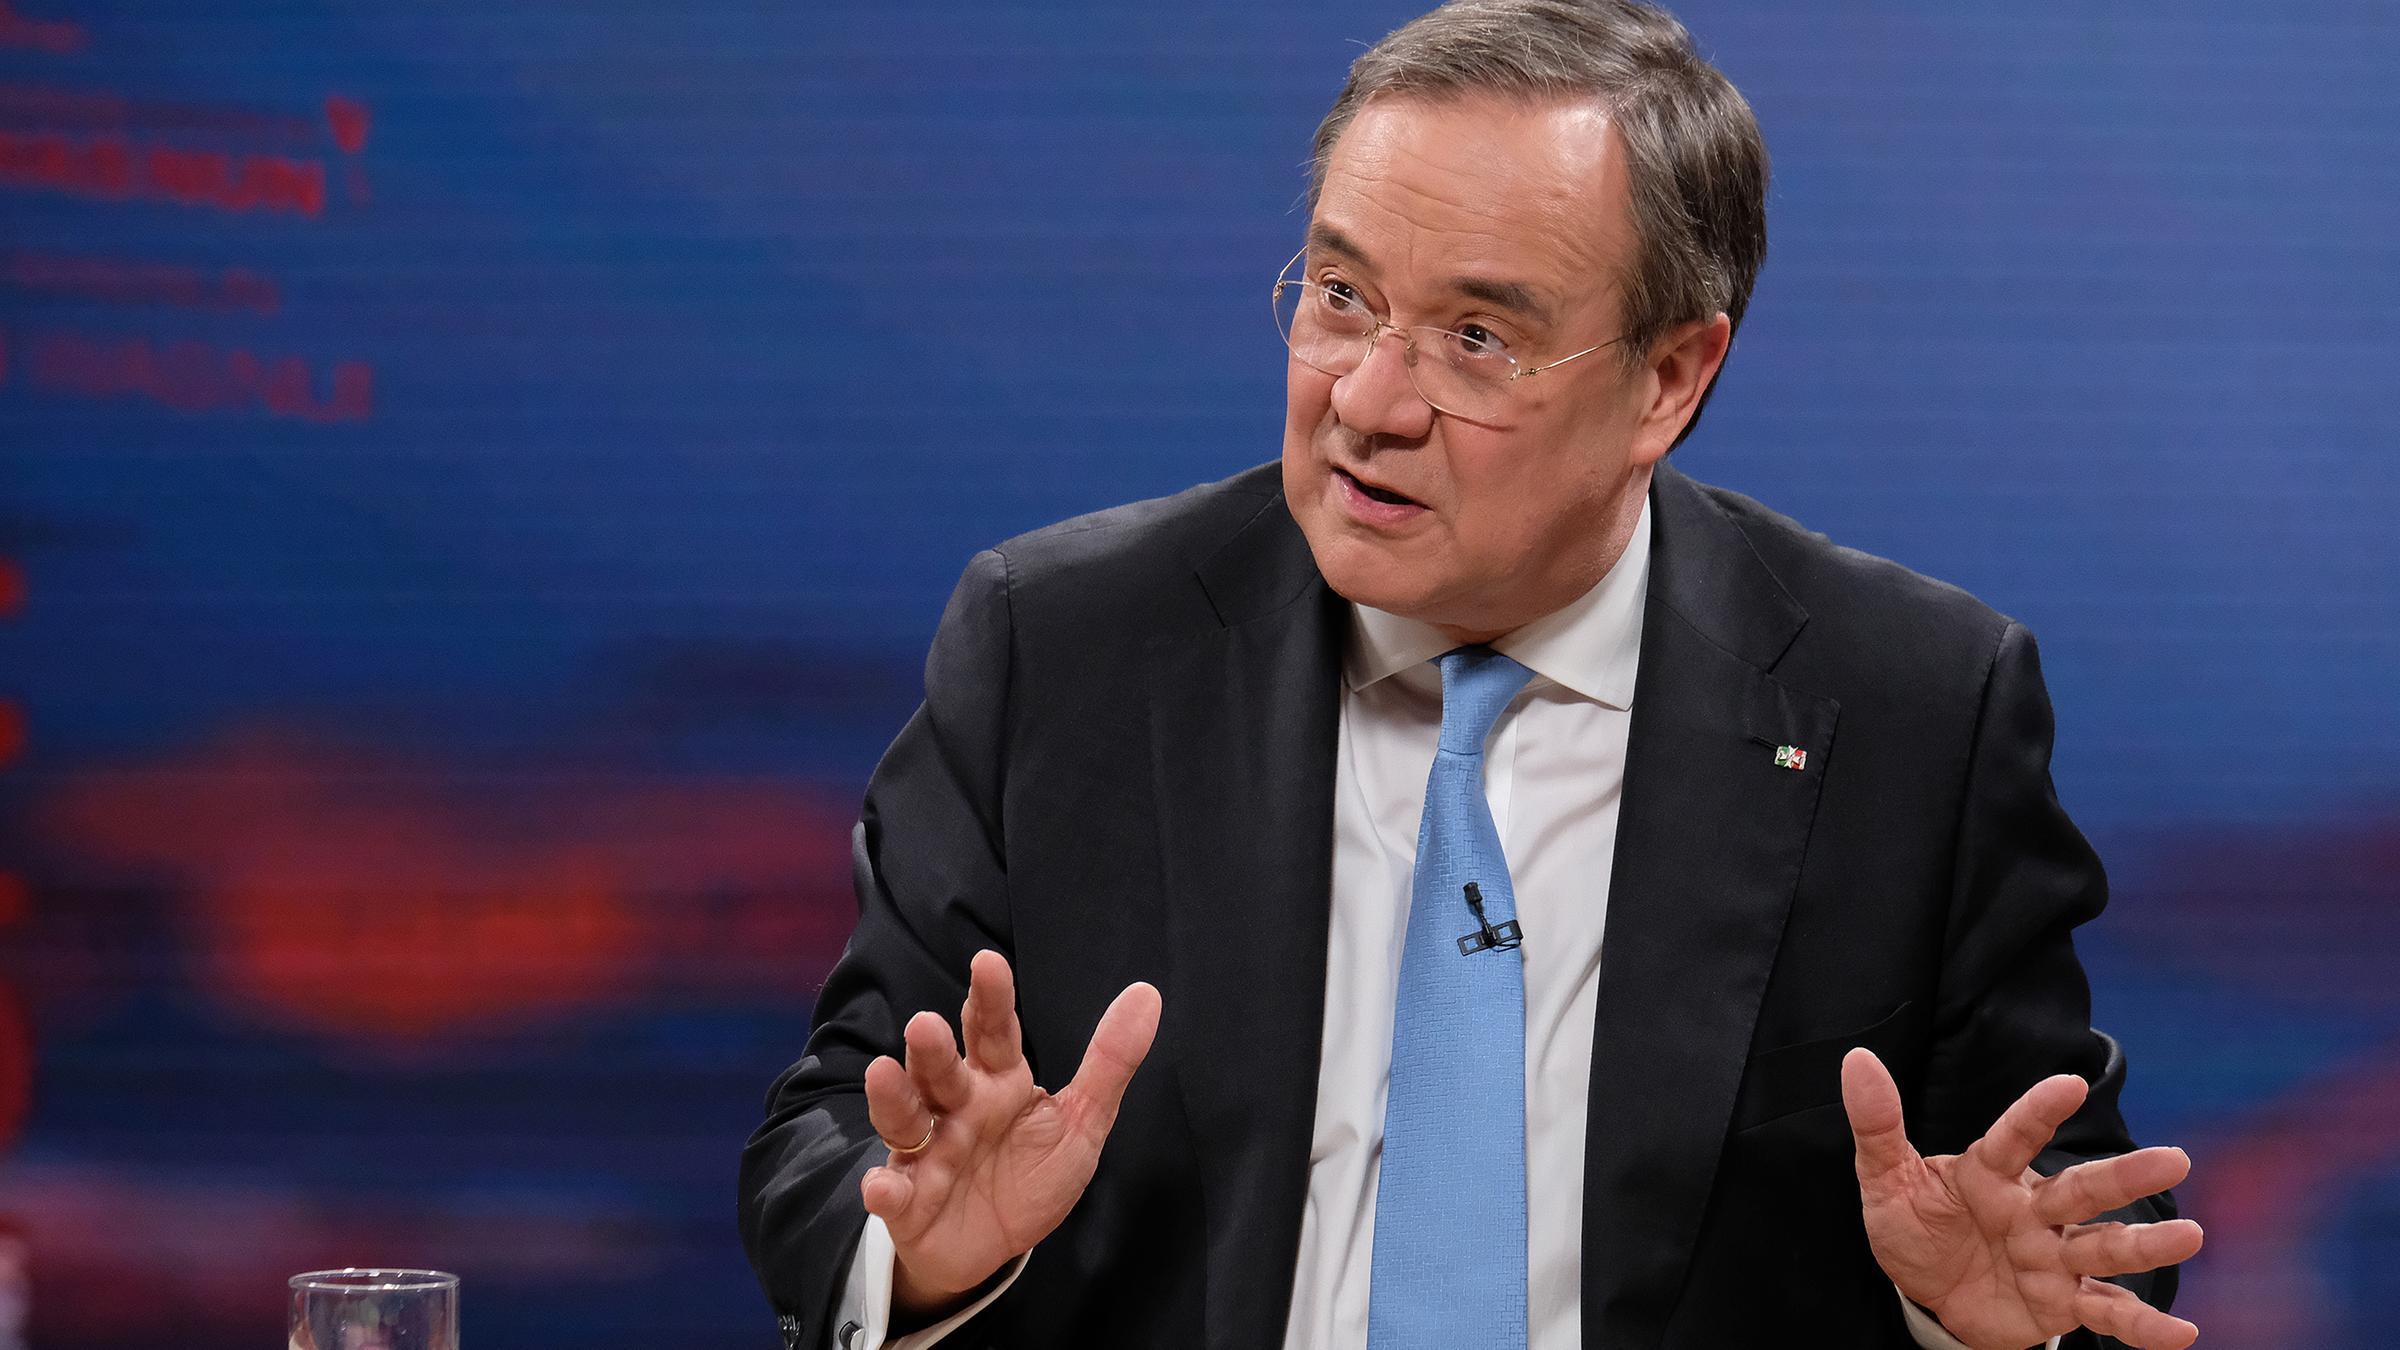 Kanzlerkandidatur: Union stärkt Laschet den Rücken - ZDFheute